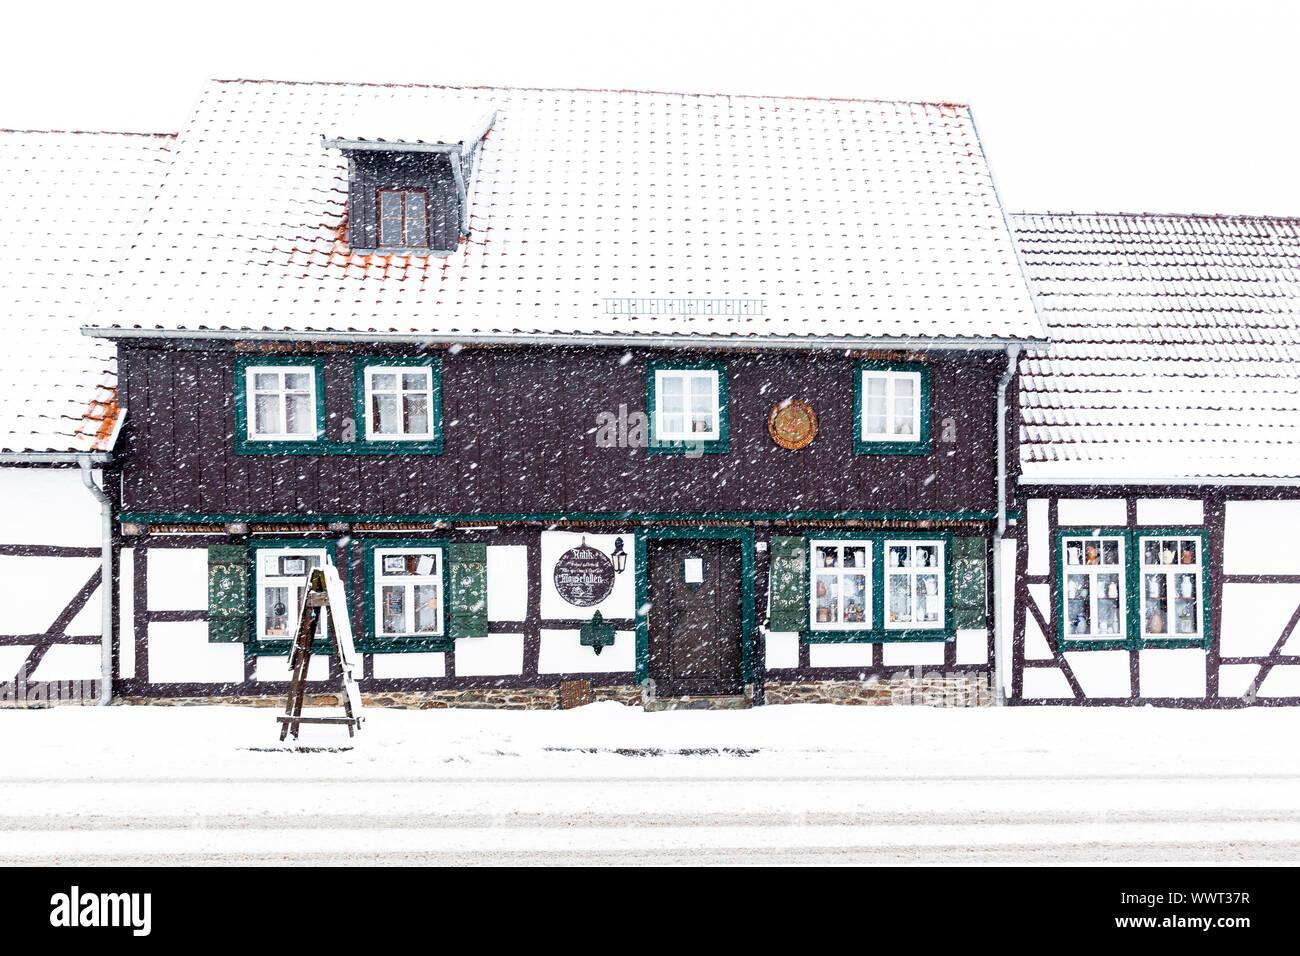 Mausefallen Museum Güntersberge in Winter Stock Photo